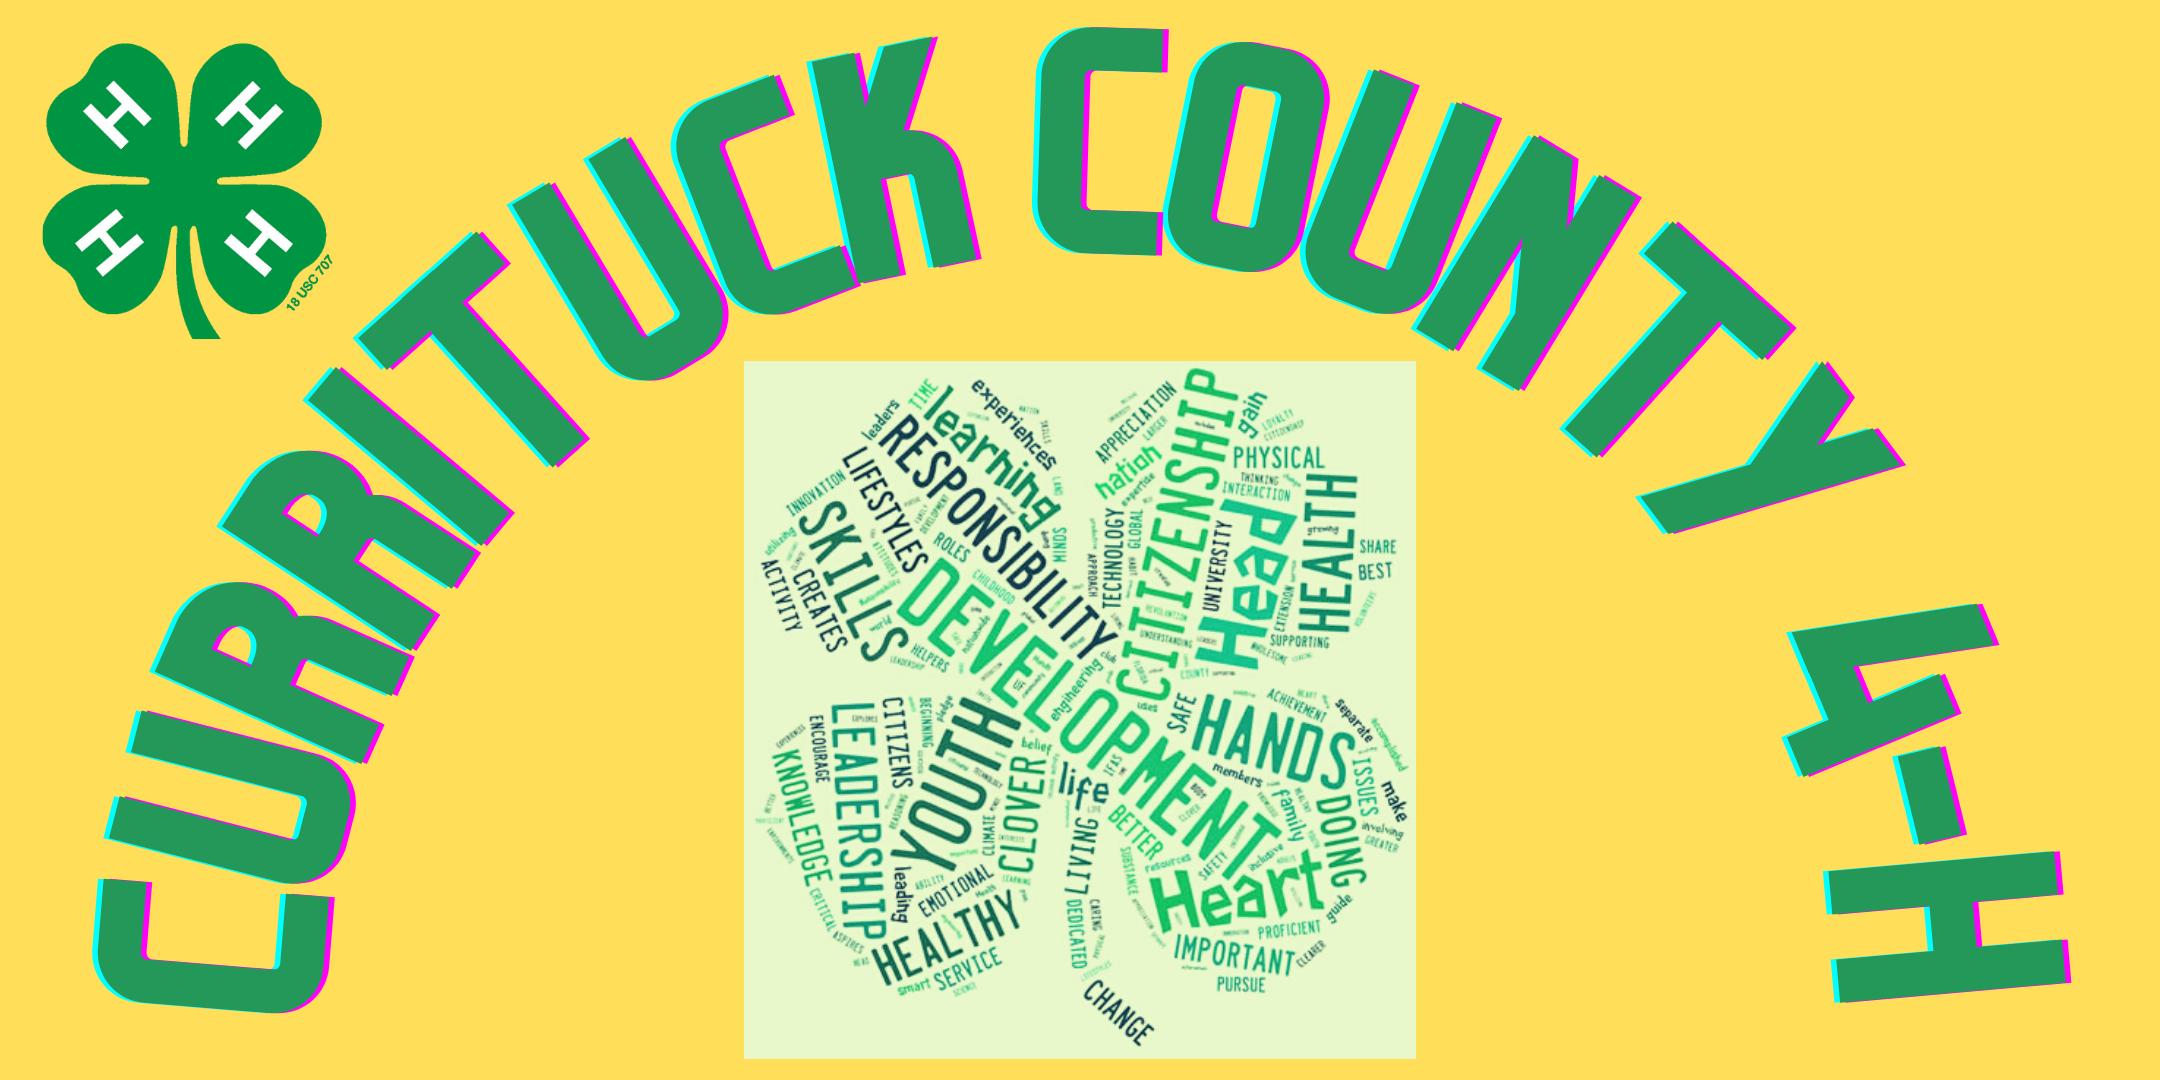 currituck county 4-h